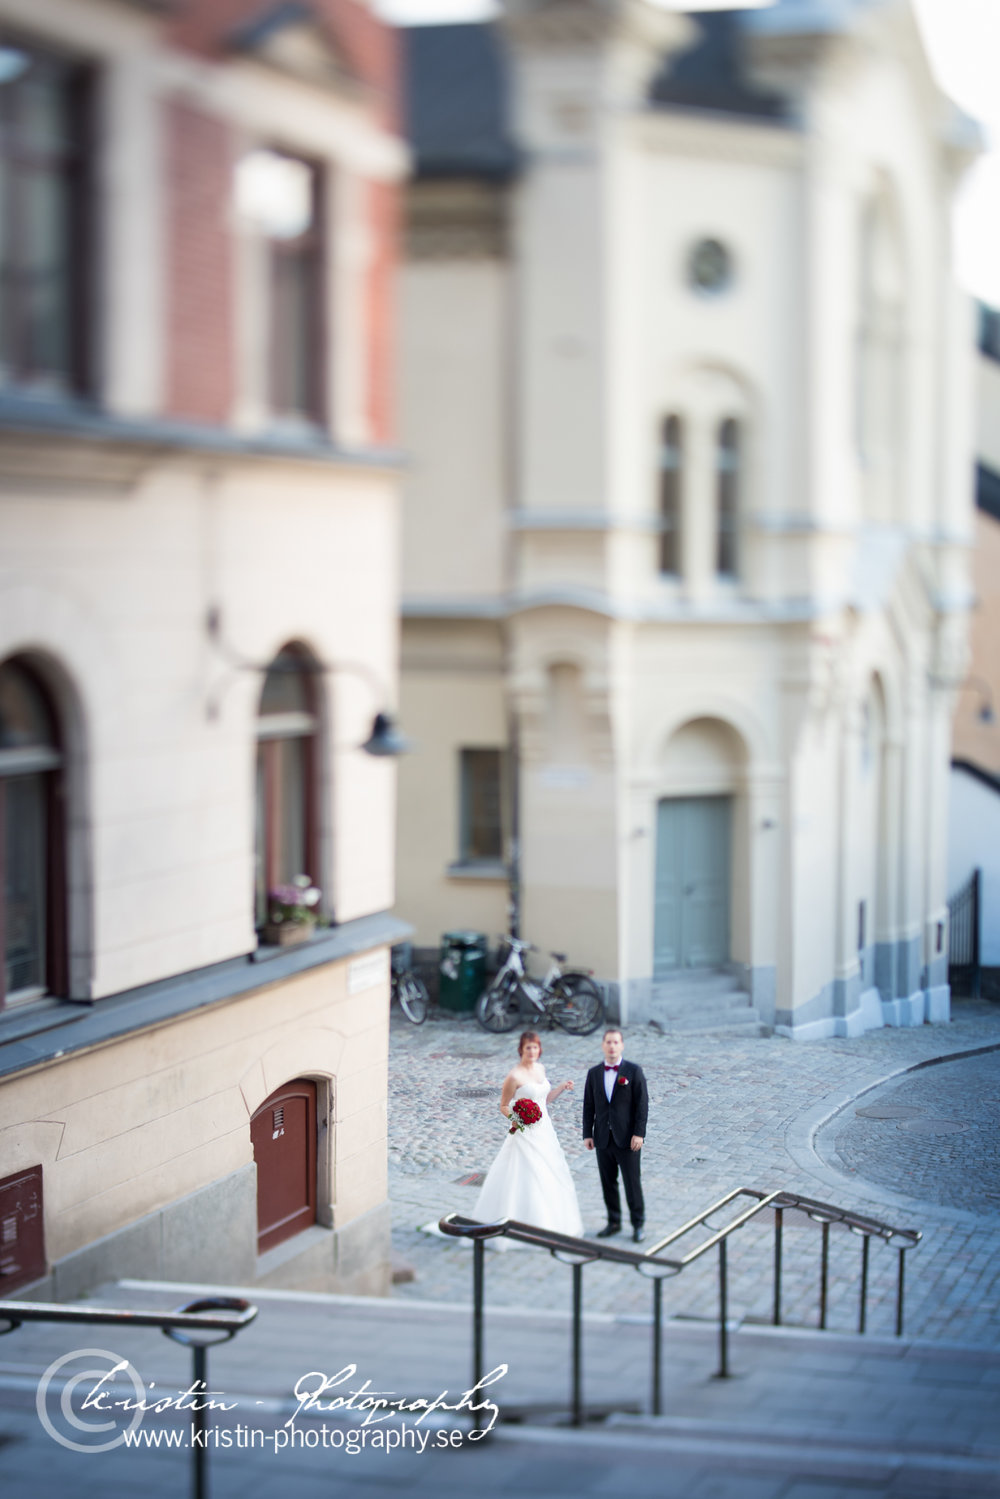 Bröllopsfotograf i Stockholm, Kristin - Photography , Munchen Bryggeriet-228.jpg